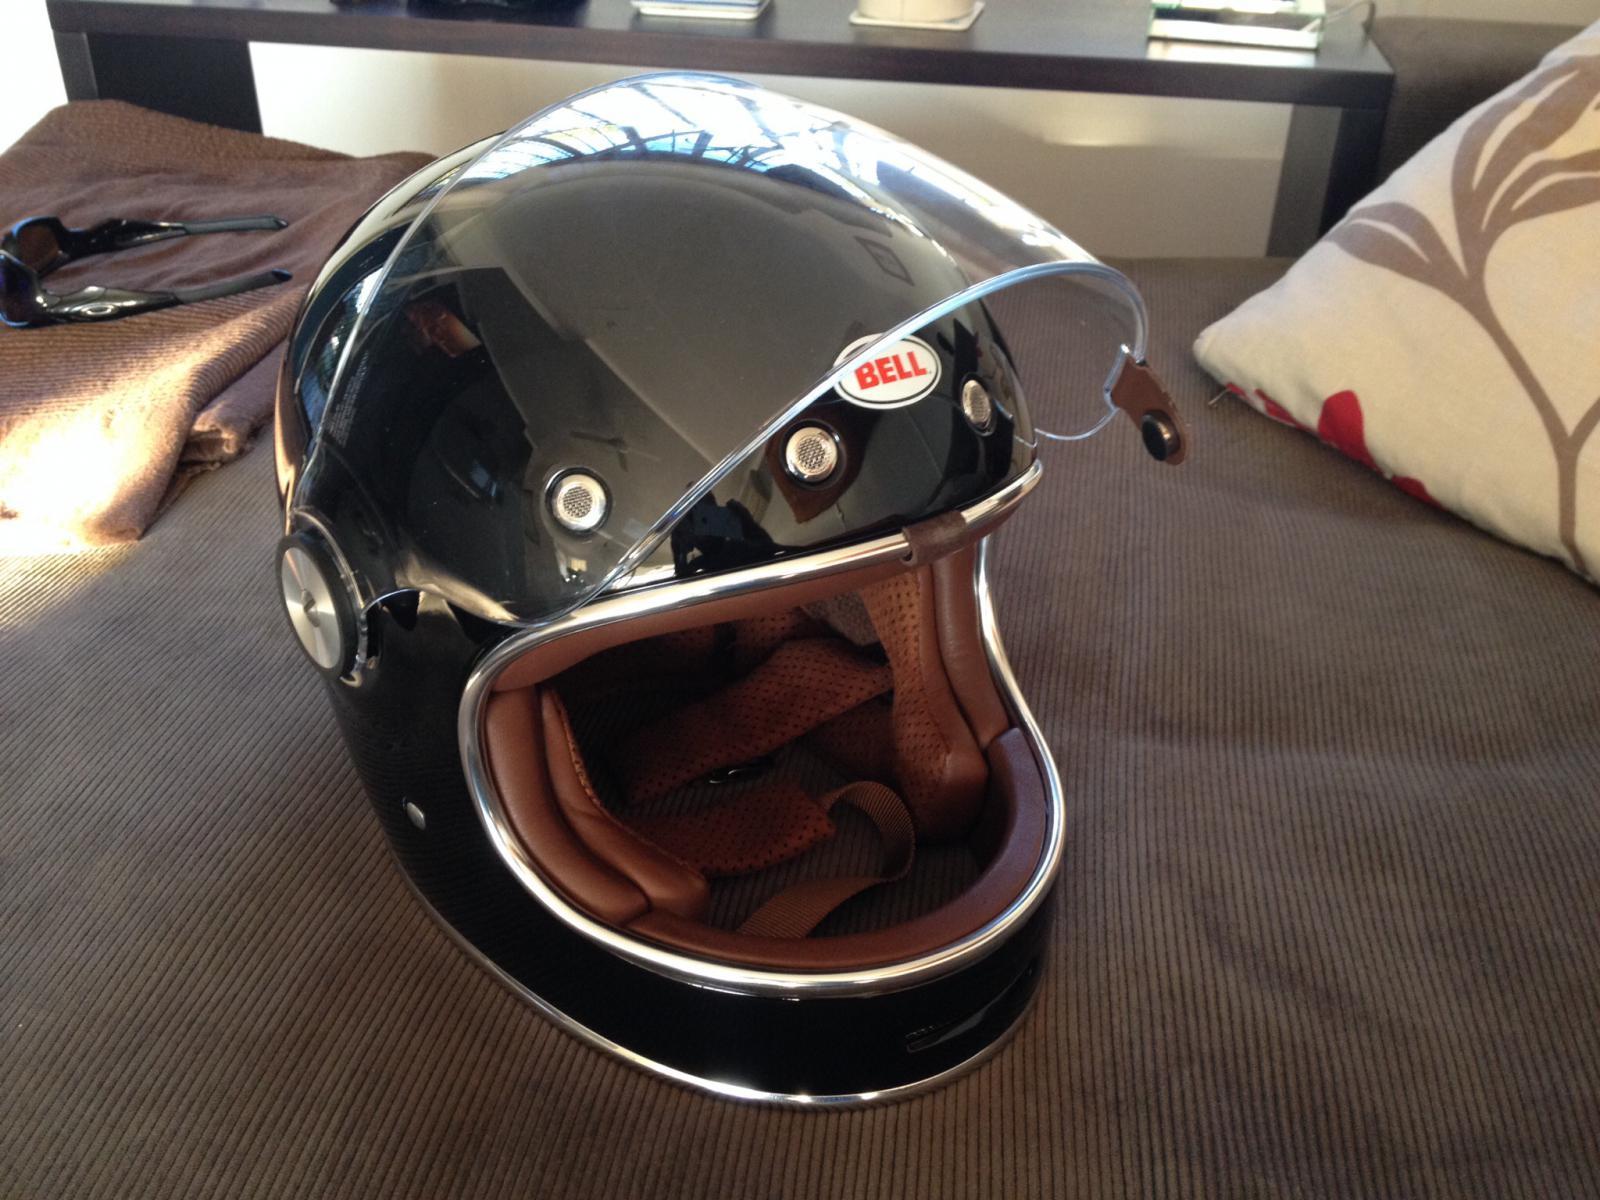 My Bell Bullitt Helmet - Page 4 - BMW NineT Forum